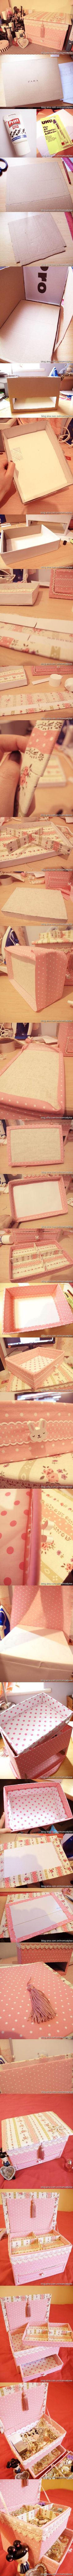 DIY Vintage Floral Cardboard Jewelry Box | iCreativeIdeas.com Like Us on Facebook ==> https://www.facebook.com/icreativeideas